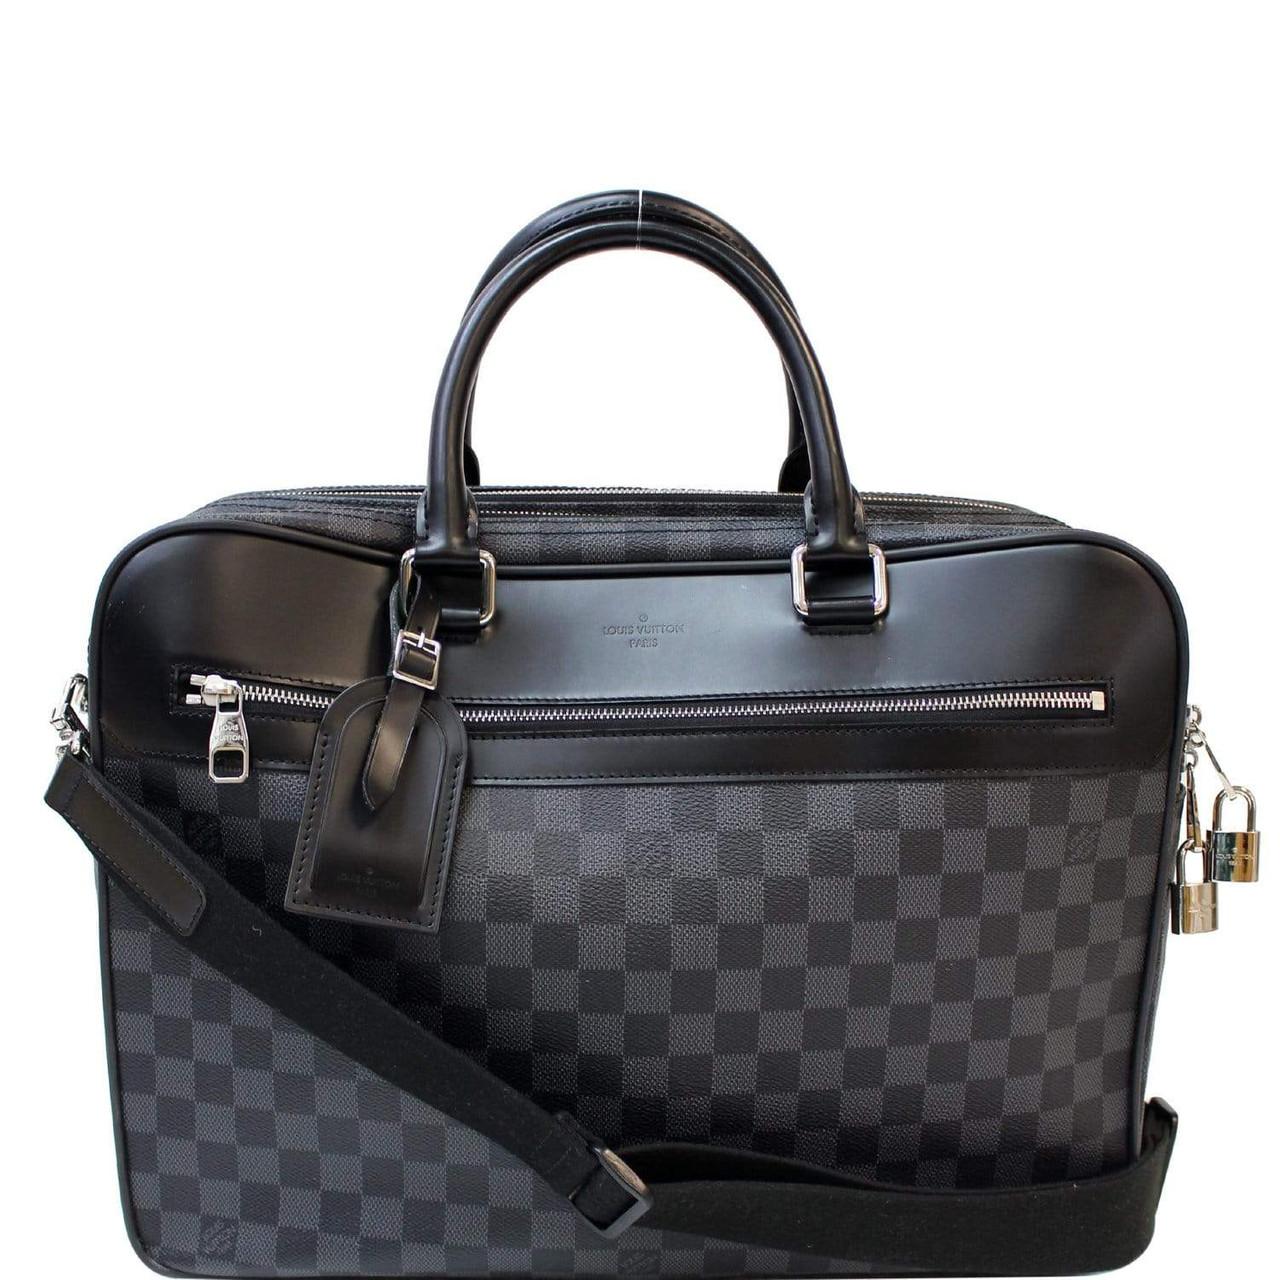 Louis Vuitton Overnight Damier Graphite